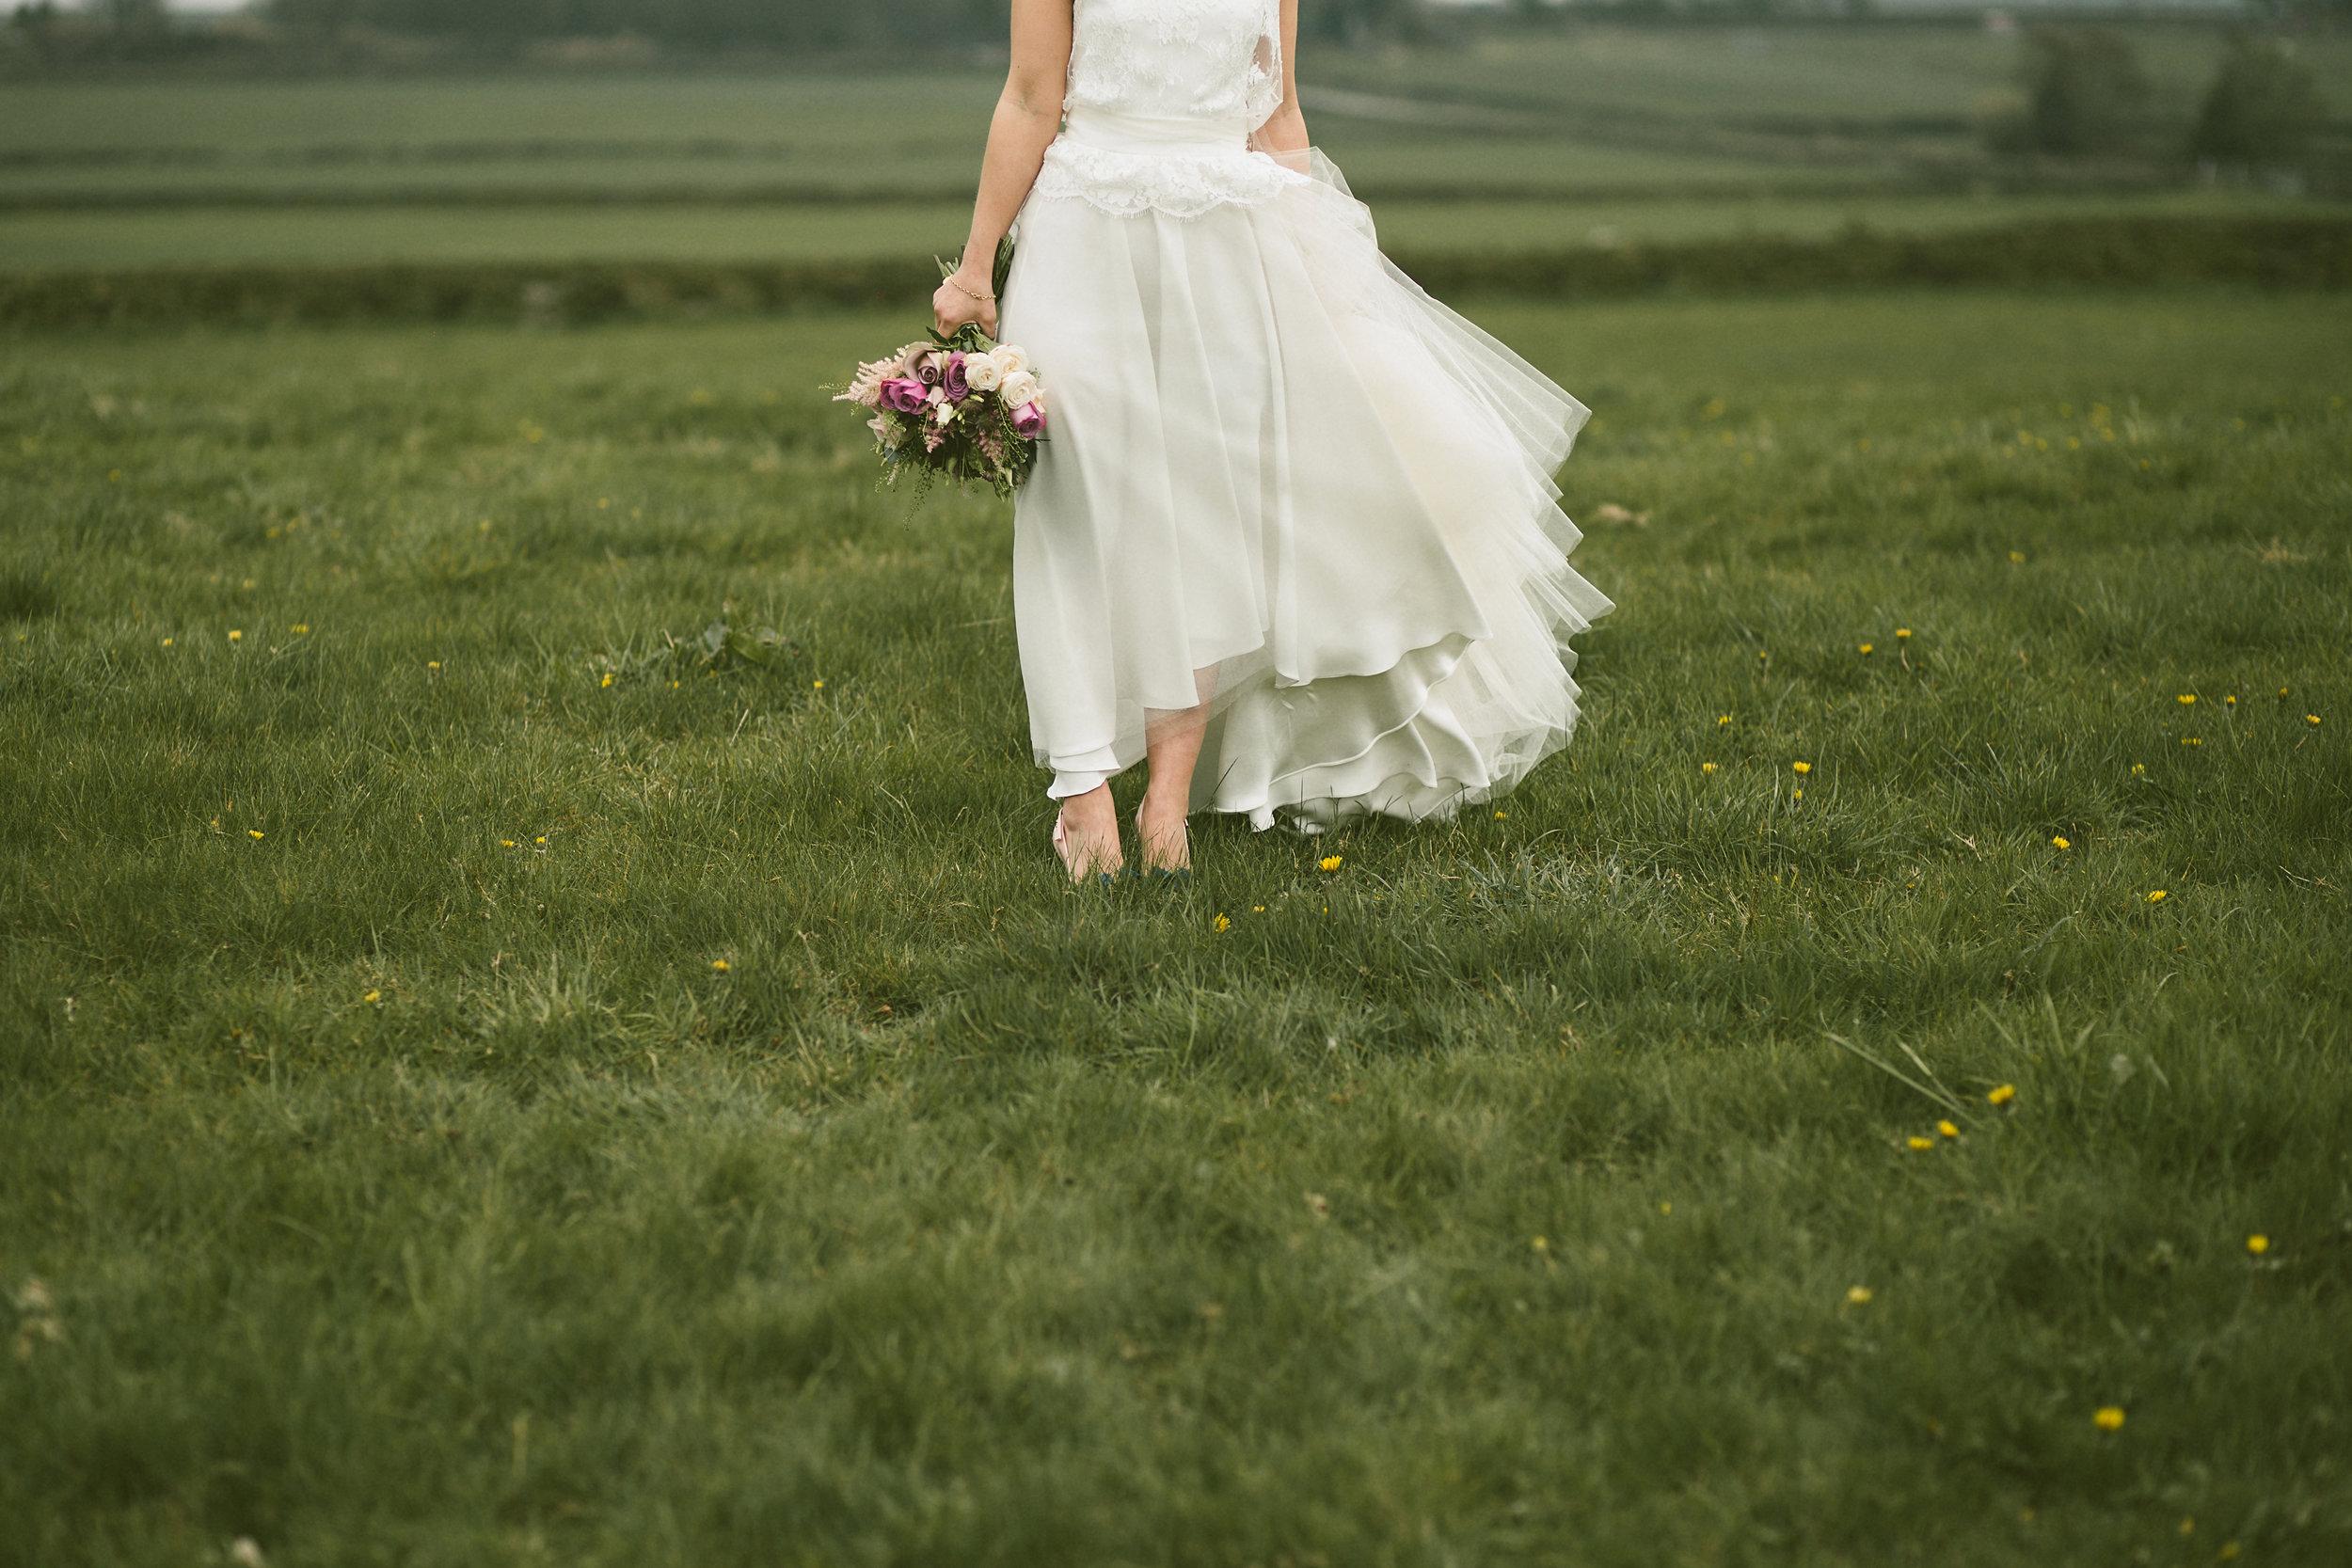 Samantha-Yorkshire-Sheffield-Bespoke-Vintage-Lace-Tulle-Bride-Wedding-Dress-Susanna-Greening-Derbyshire-4